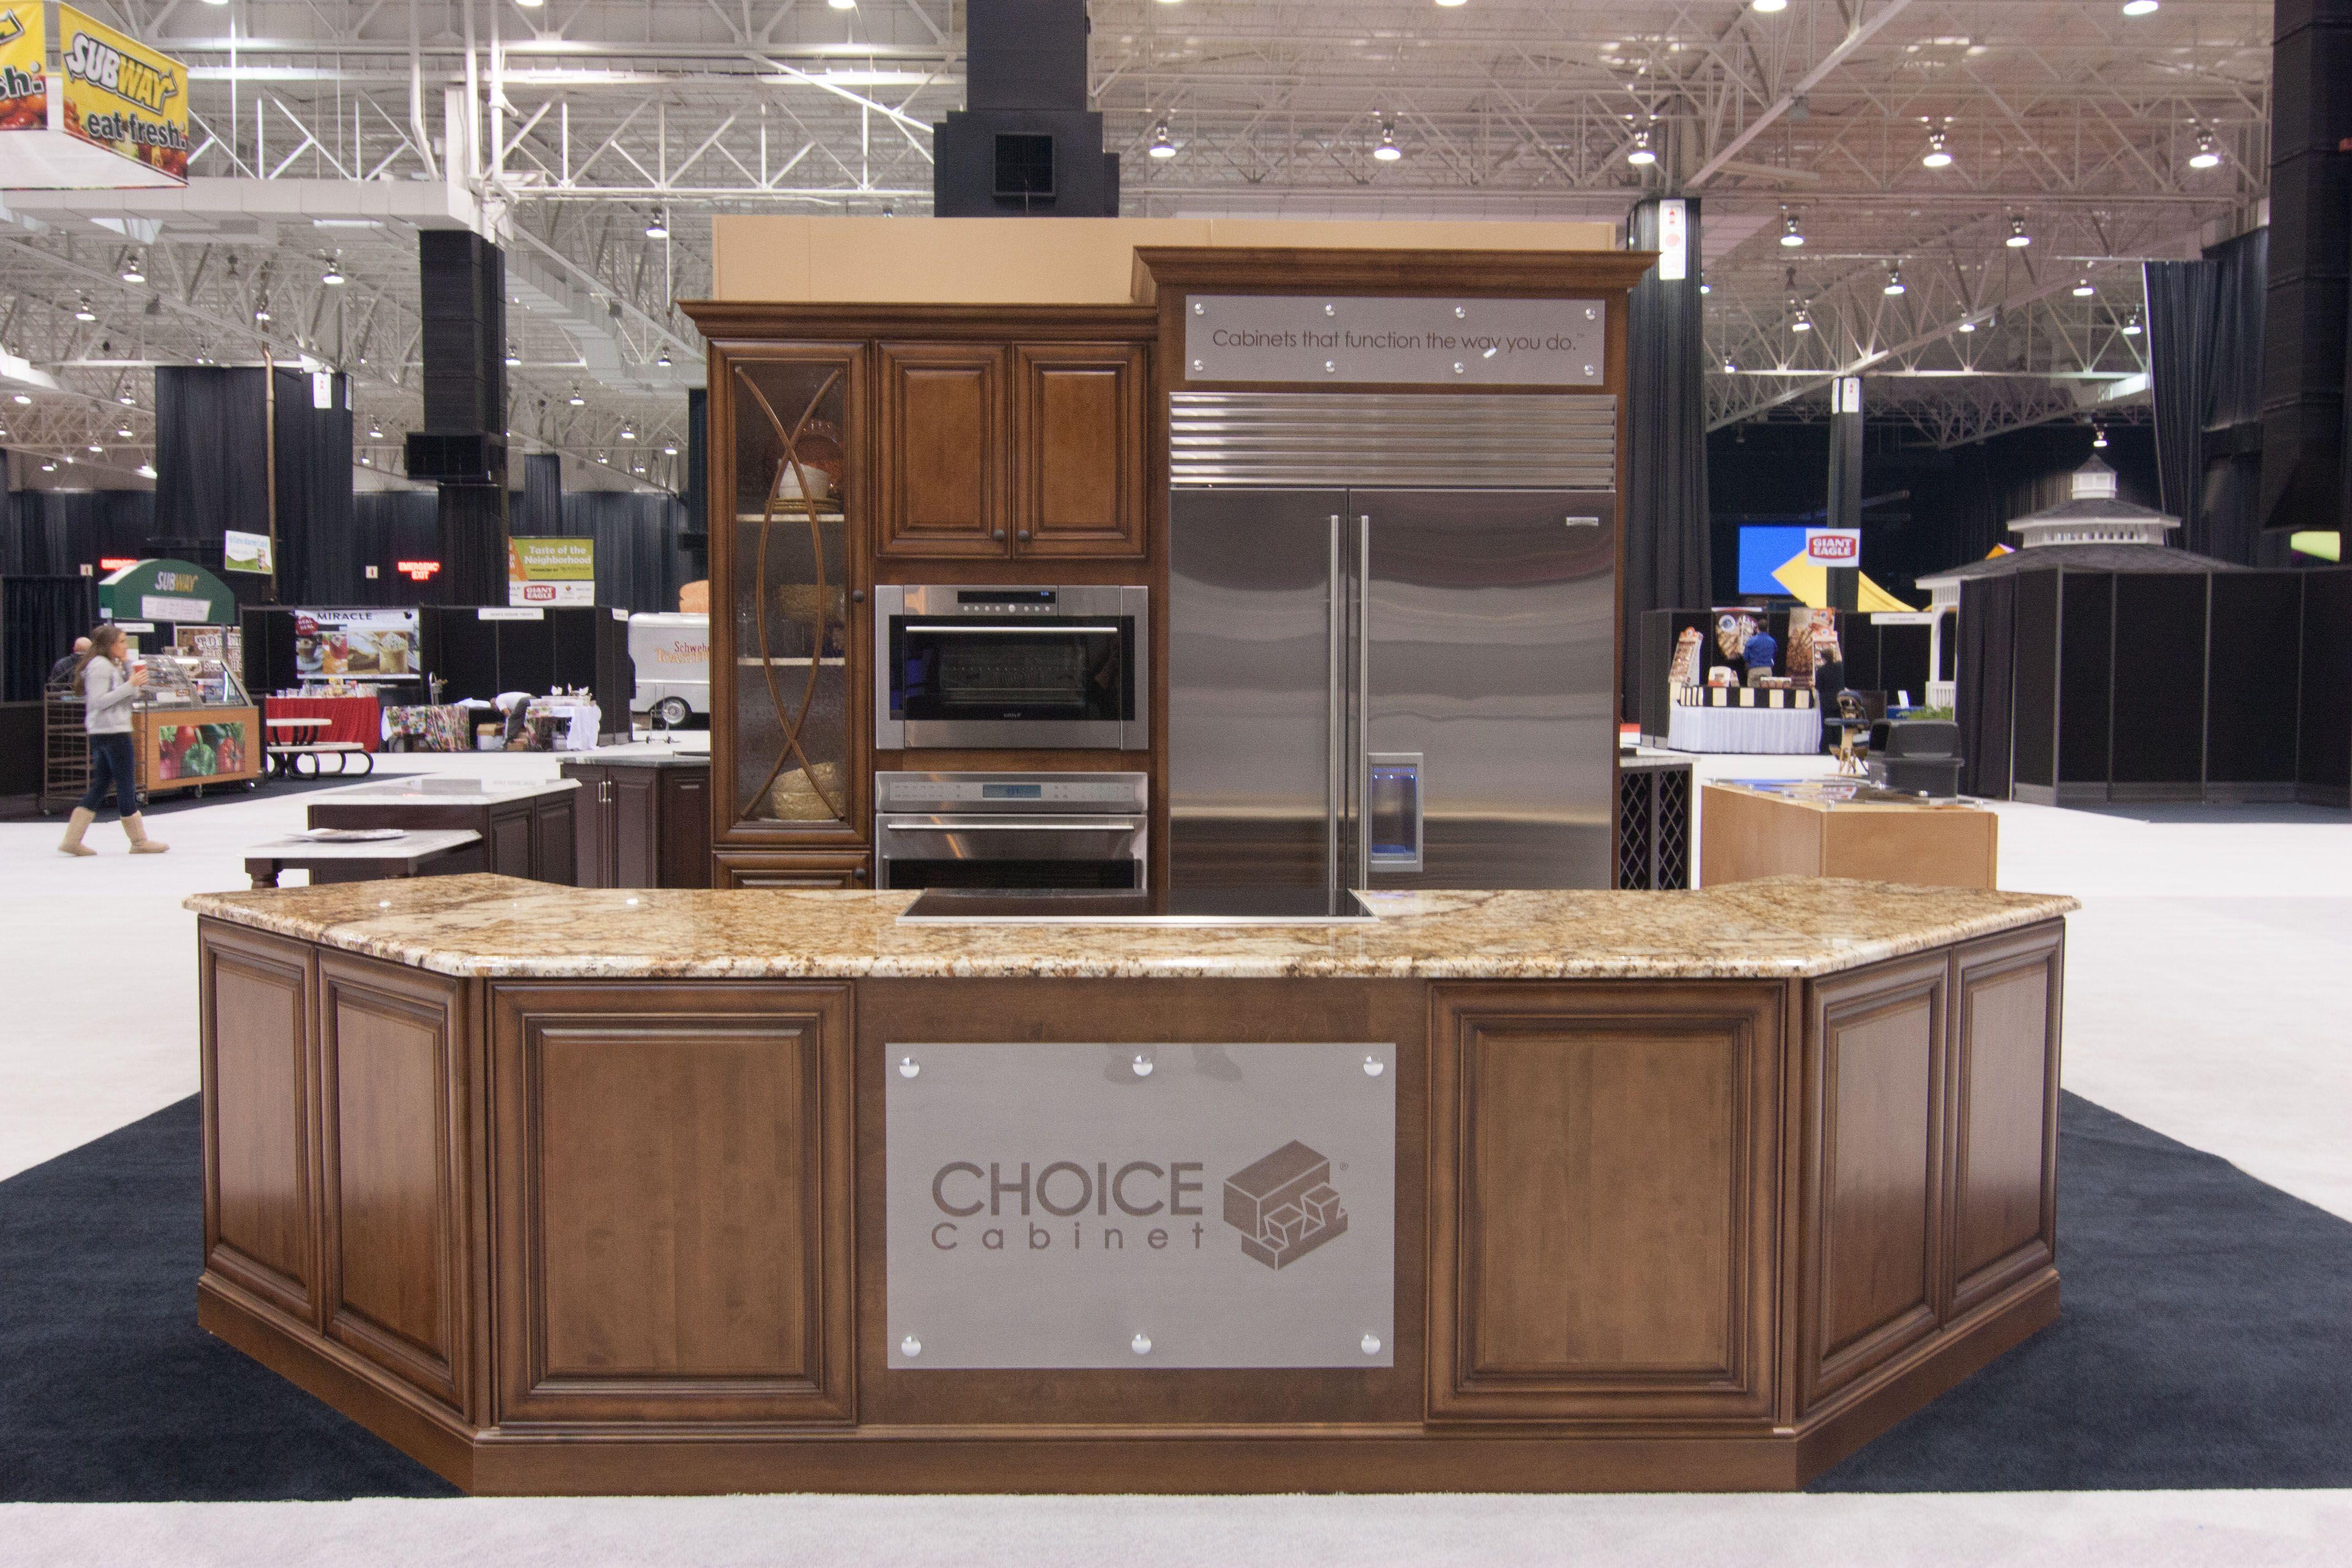 Kitchen Cabinet Design Wholesale Prices Choice Cabinet Kitchen Cabinet Design Kitchen Design Kitchen